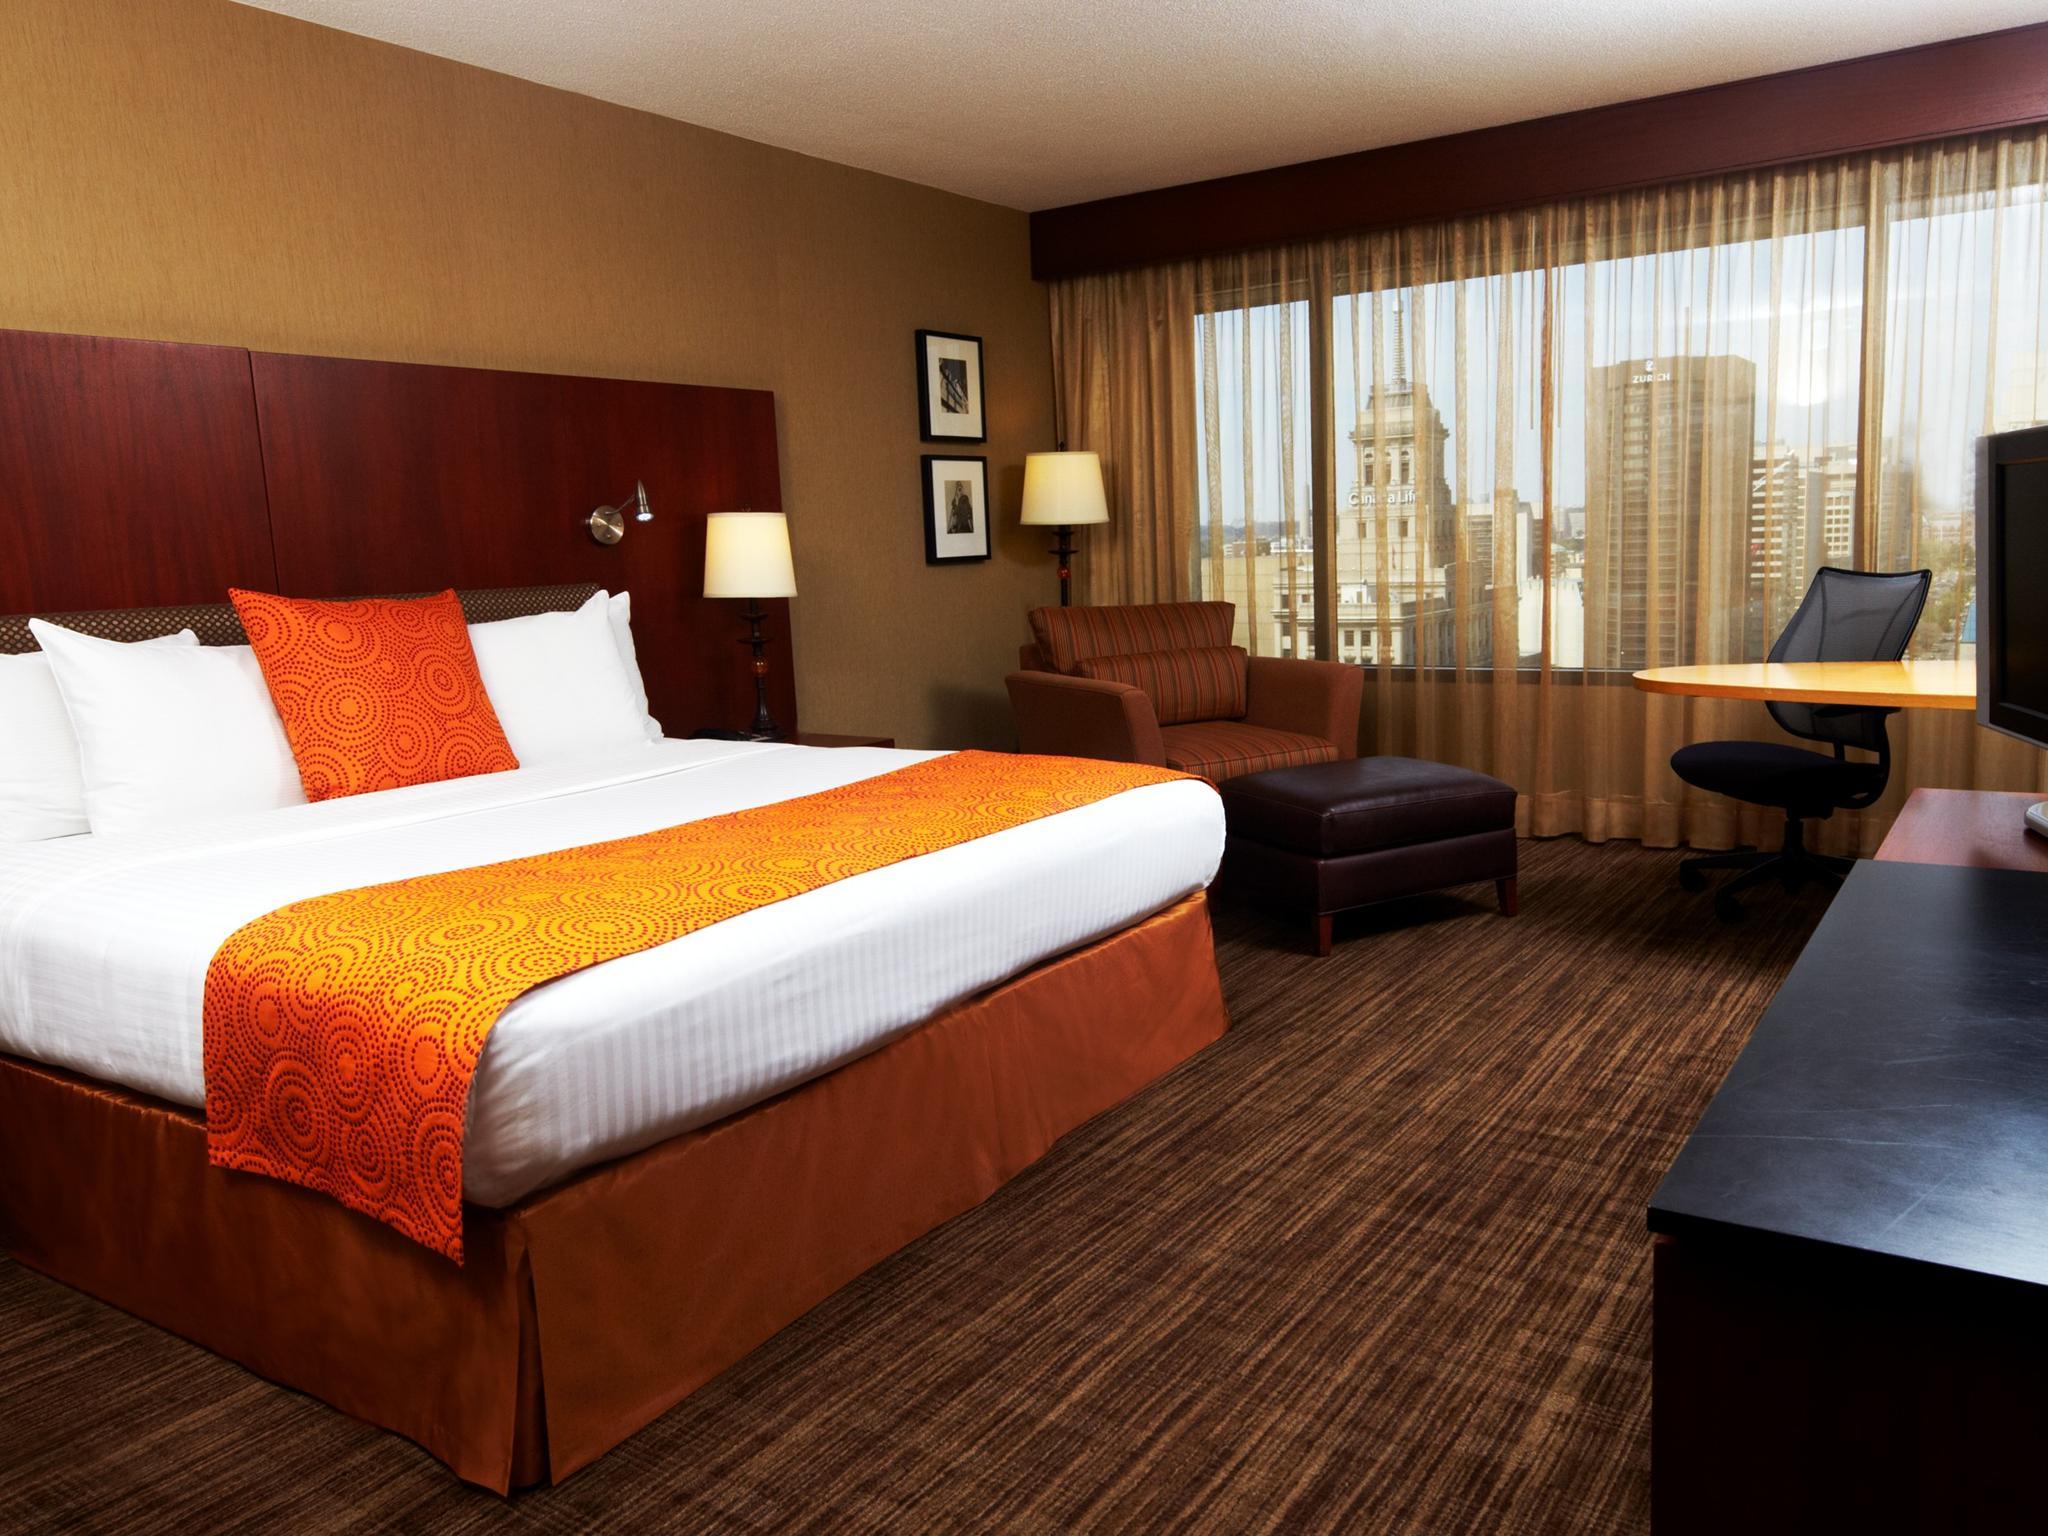 Mobilier Chambre Bebe Originale :  Toronto Hotel, ON, Canada  Chambre de luxe avec très grand lit